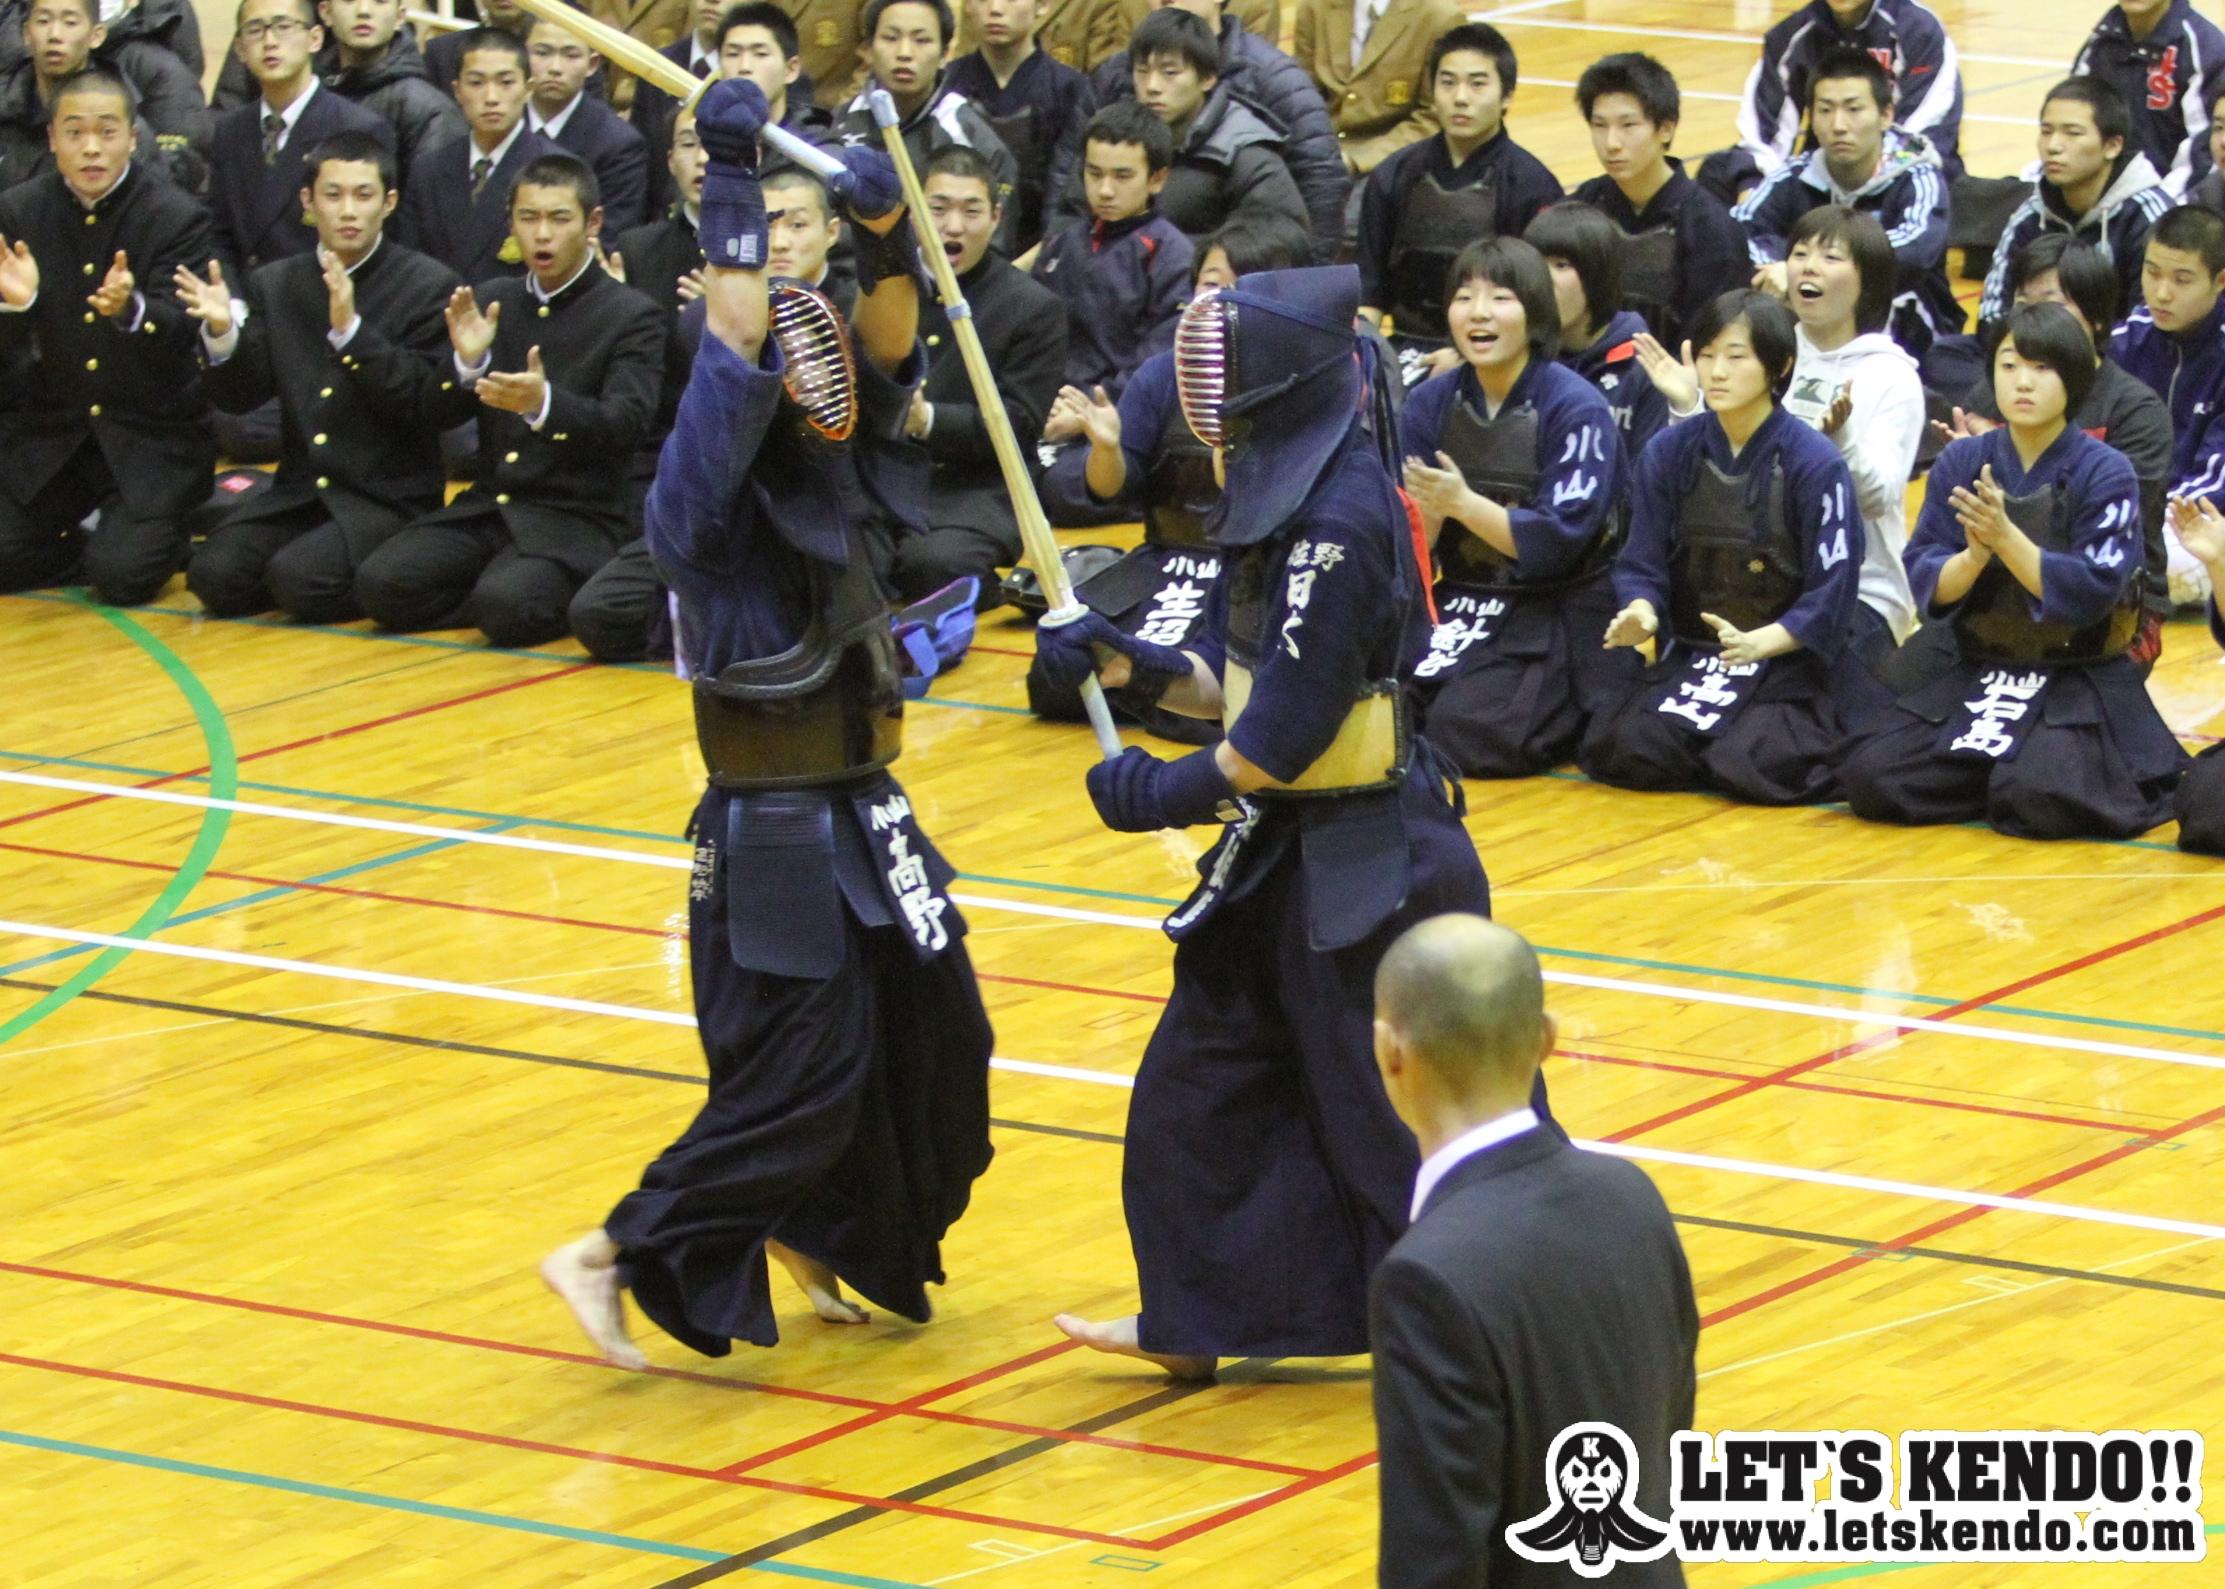 【リアルタイム速報&生中継】3/5 関東近県高校選抜剣道大会